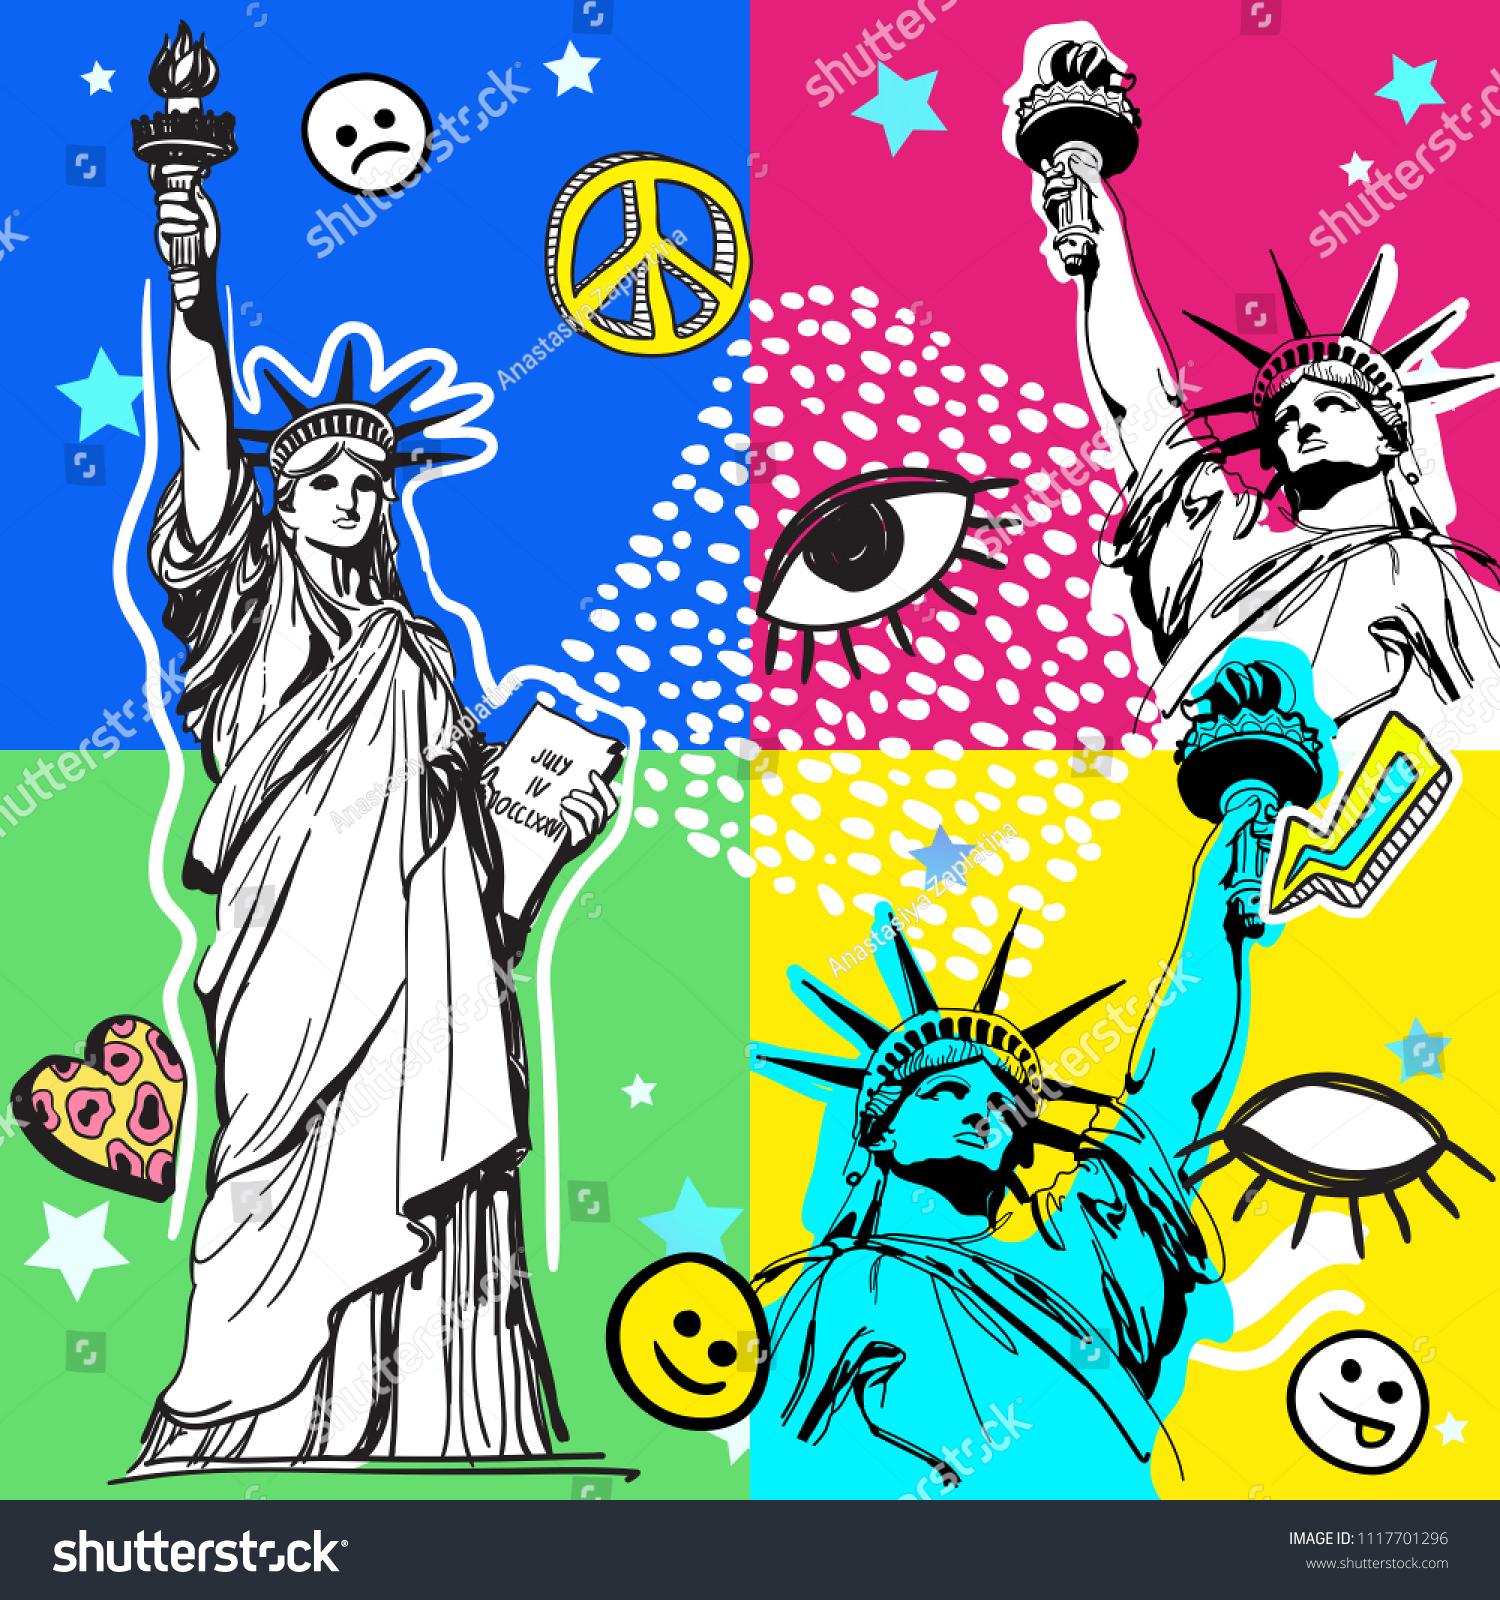 Retro Pop Art Style Colorful Illustration 80S Fashion, 80S Print Memphis